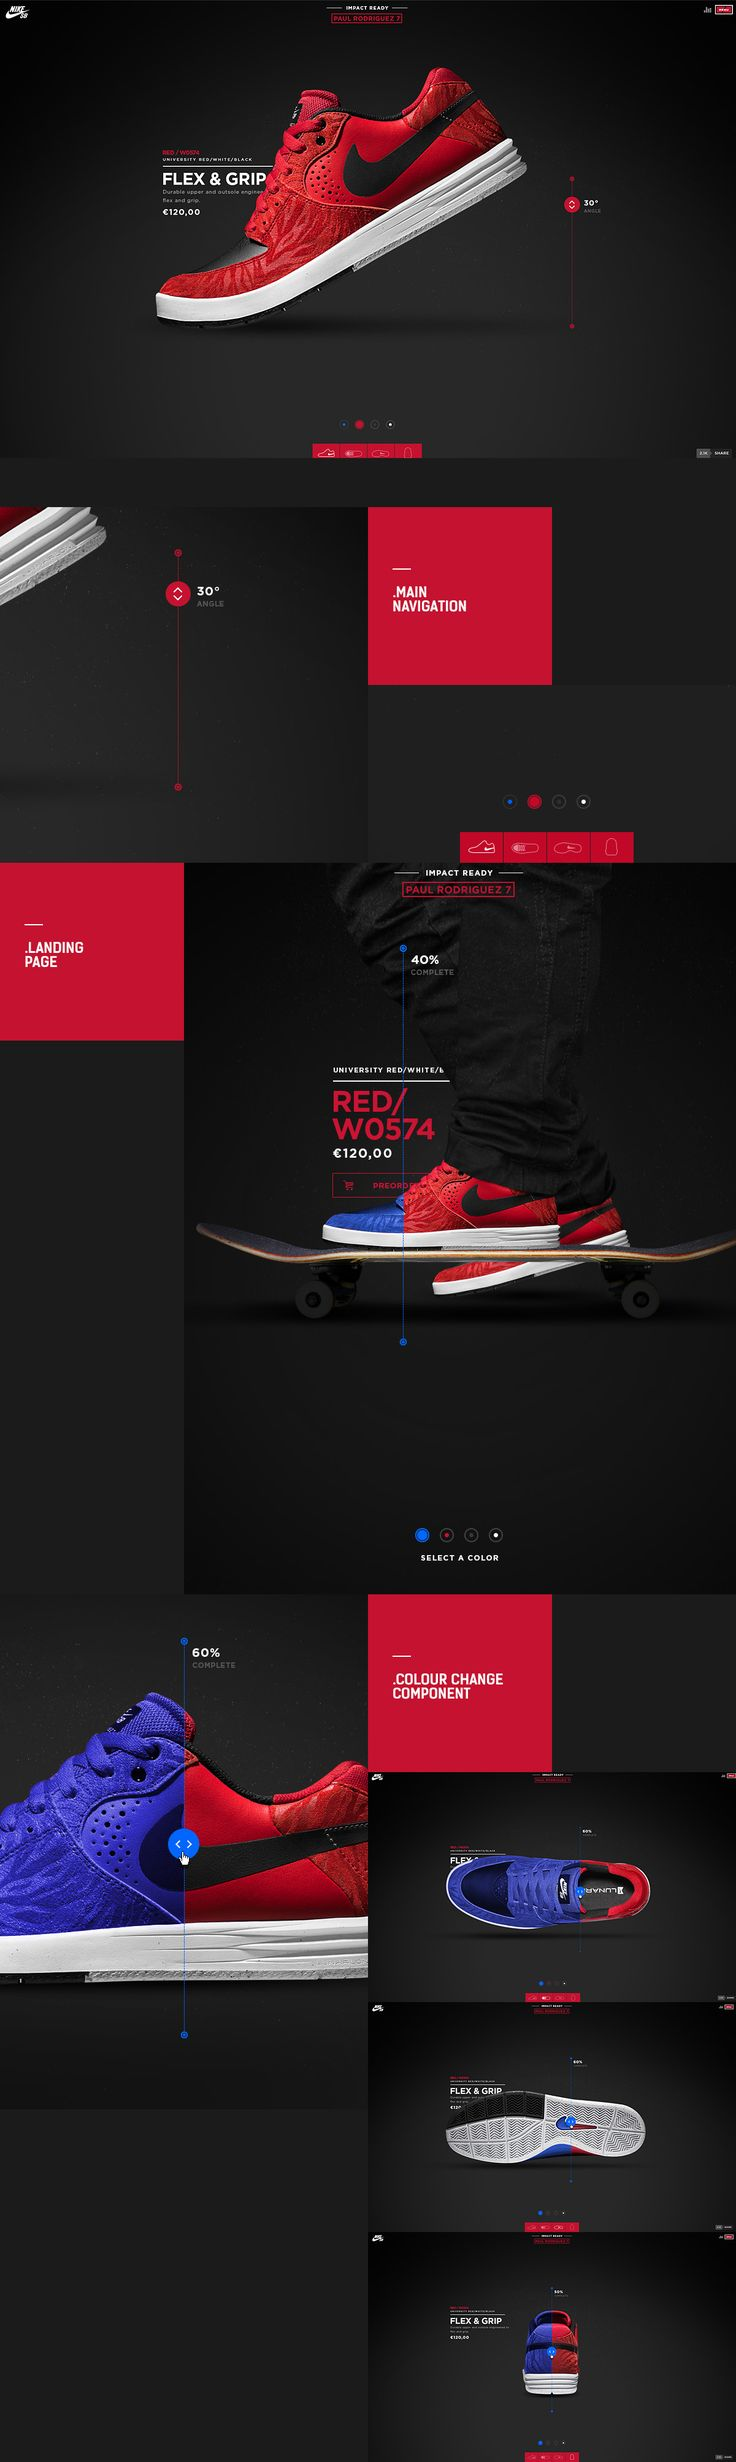 5 talentueux Webdesigners et Designers d'interface #5 | Design Spartan : Art digital, digital painting, webdesign, illustration et inspiration…